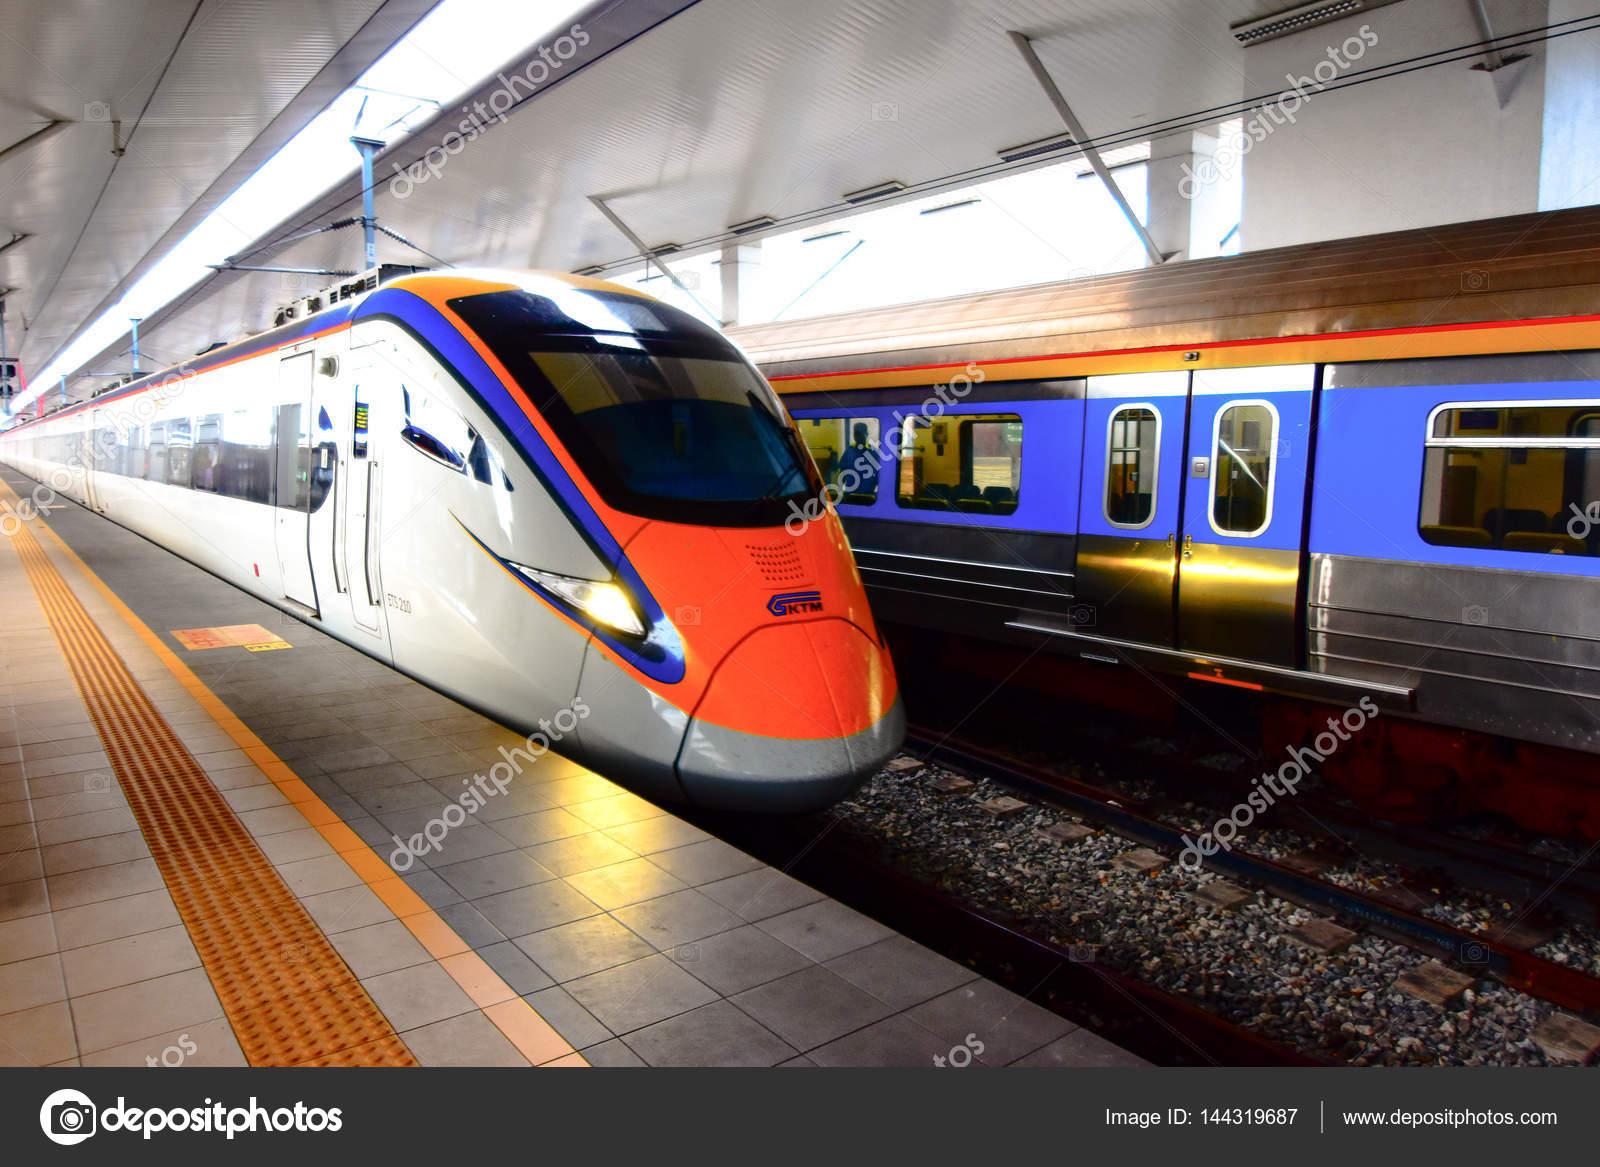 ets train inter city rail service in malaysia stock editorial